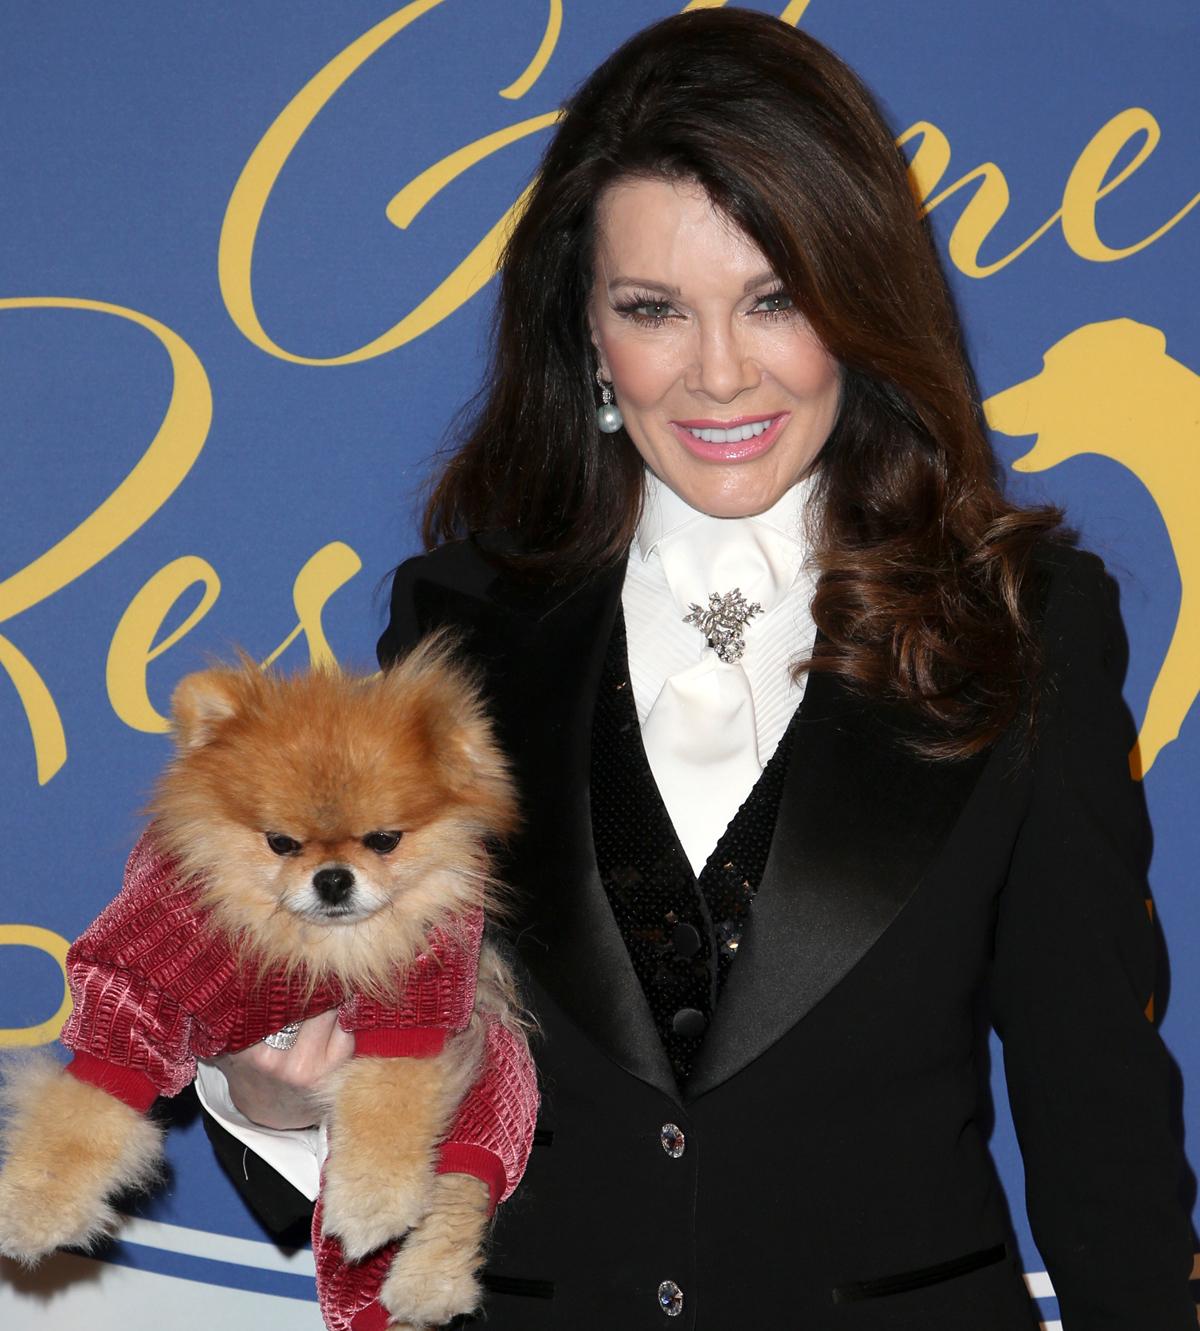 LIsa Vanderpump dogs reality TV spinoff show